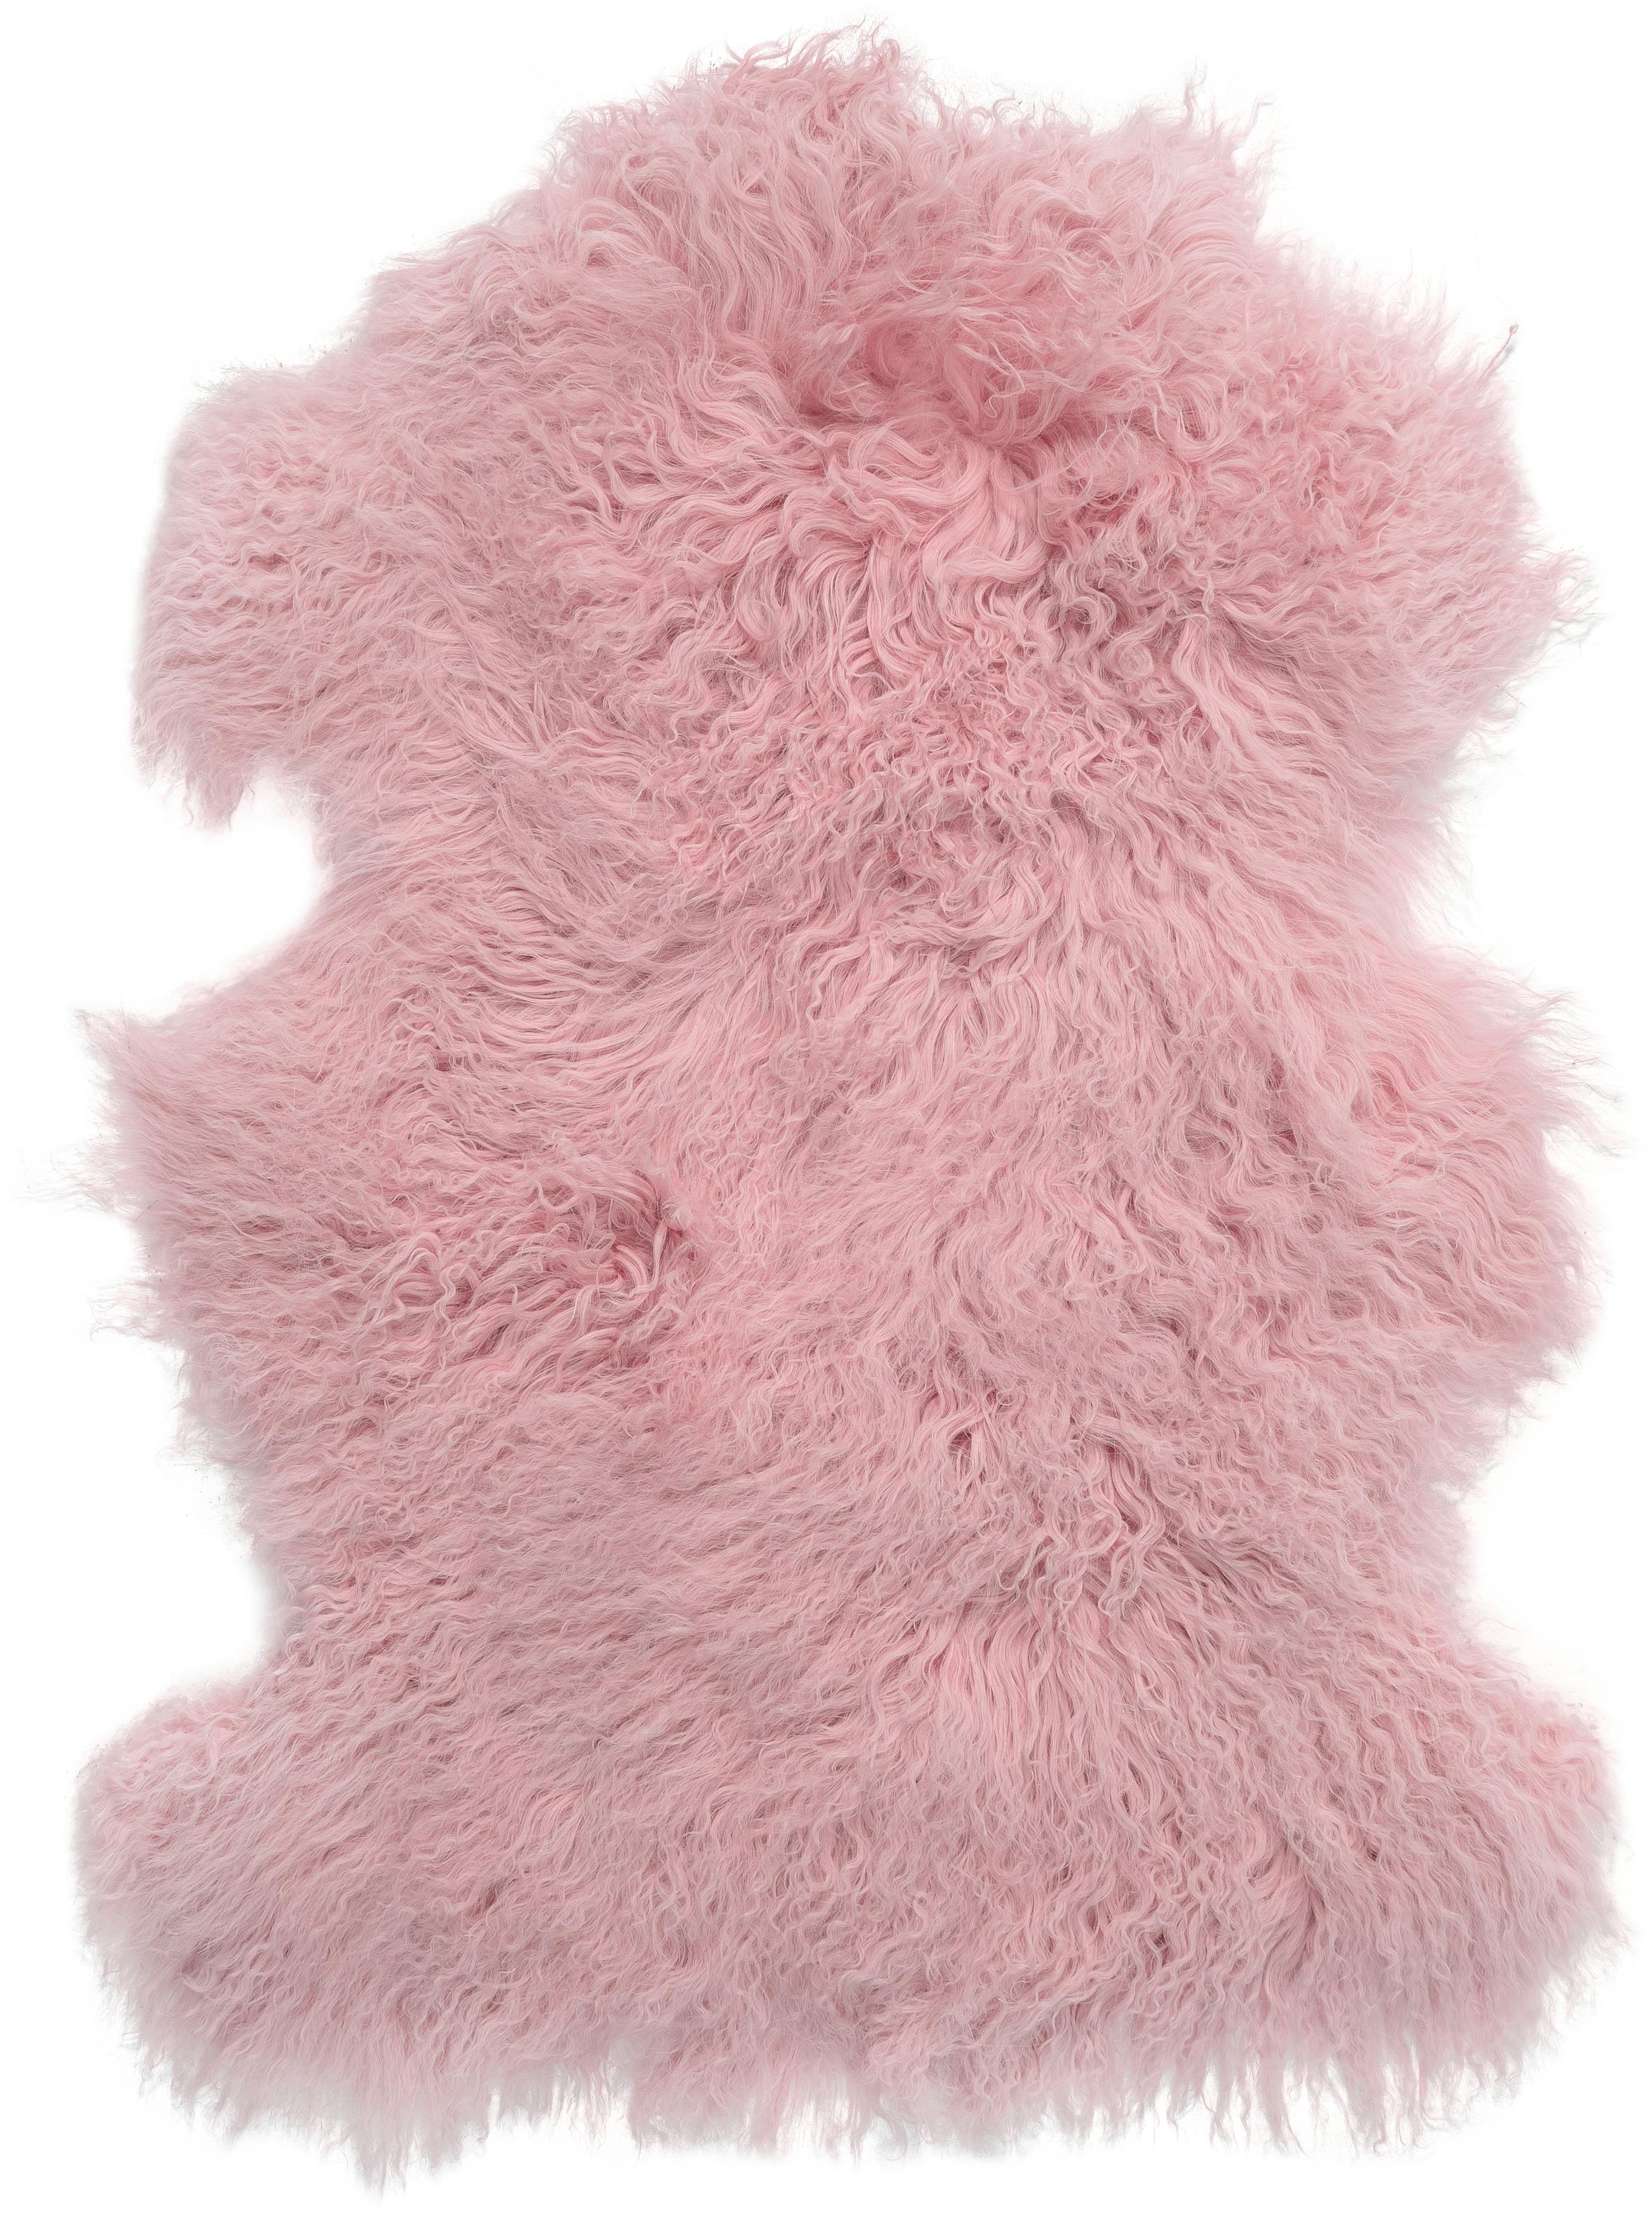 Langhaar-Lammfell Ella, gelockt, Vorderseite: Mongolisches Lammfell, Rückseite: Leder, Rosa, 50 x 80 cm